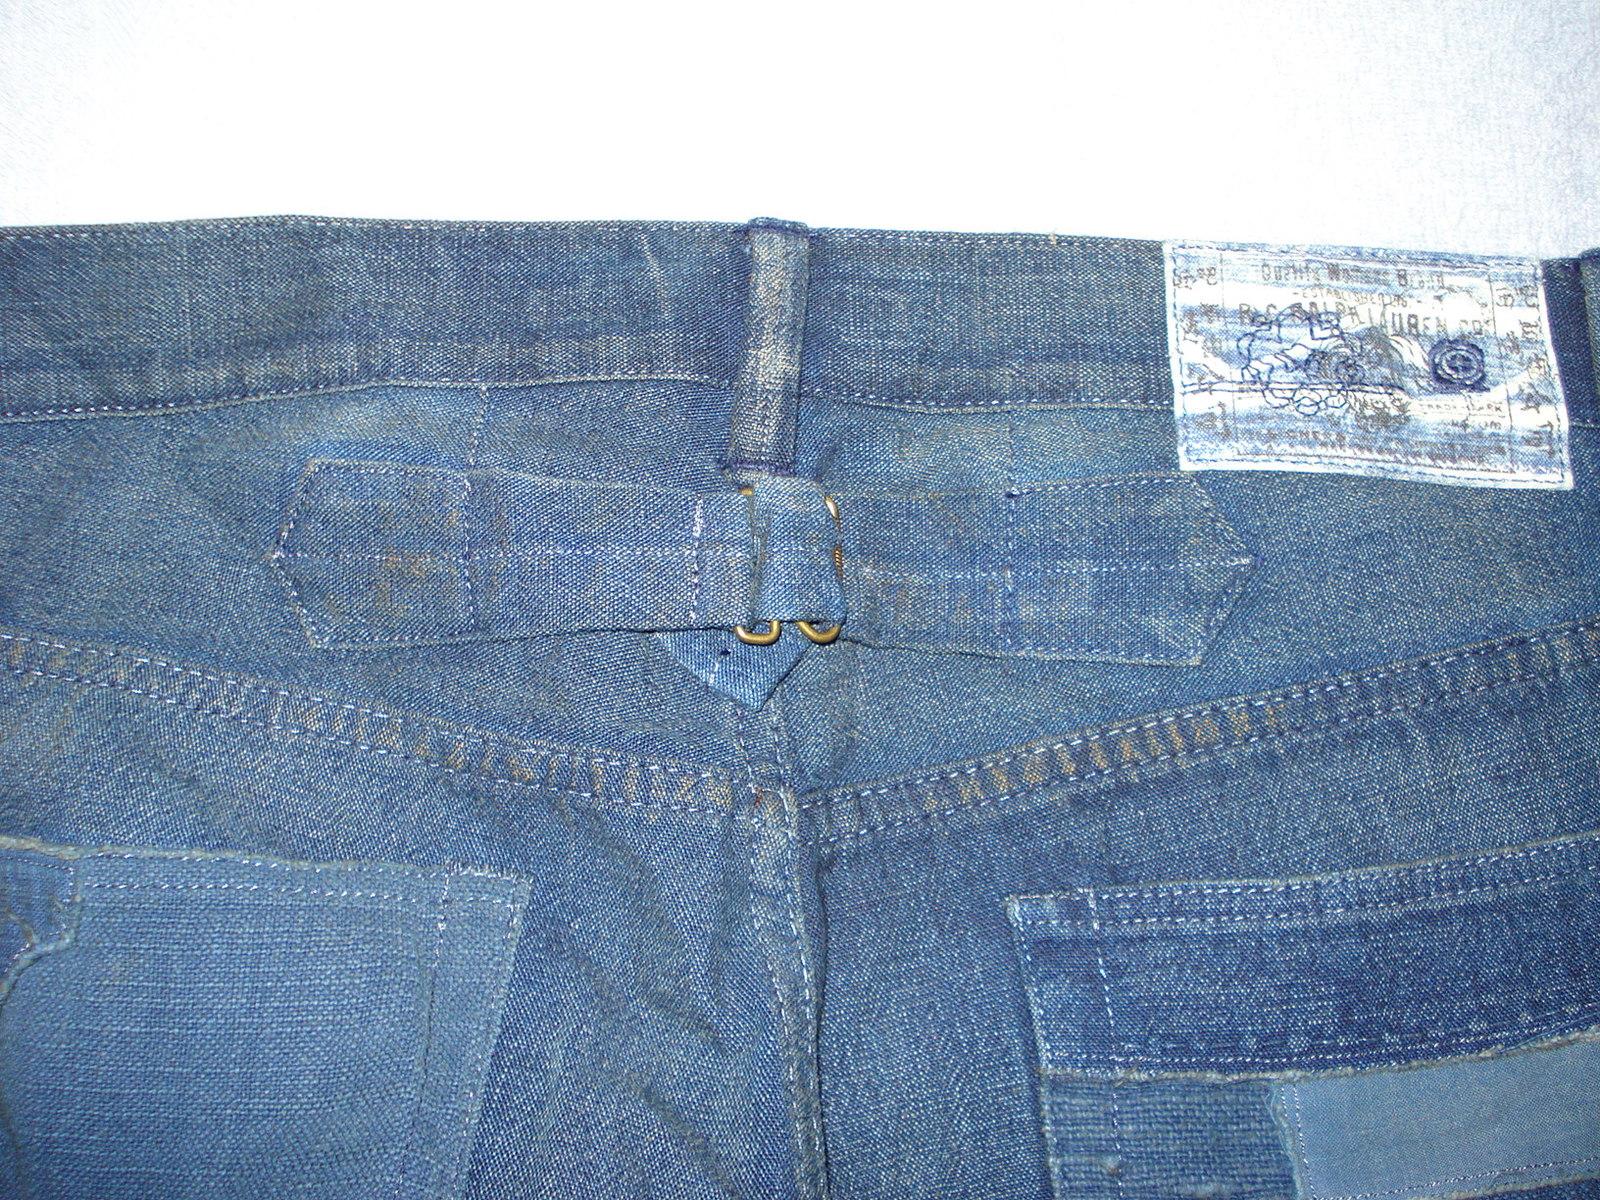 NWT Ralph Lauren Blue Label Indochine Patchwork Jeans 100% Cotton Size 27  - $92.00